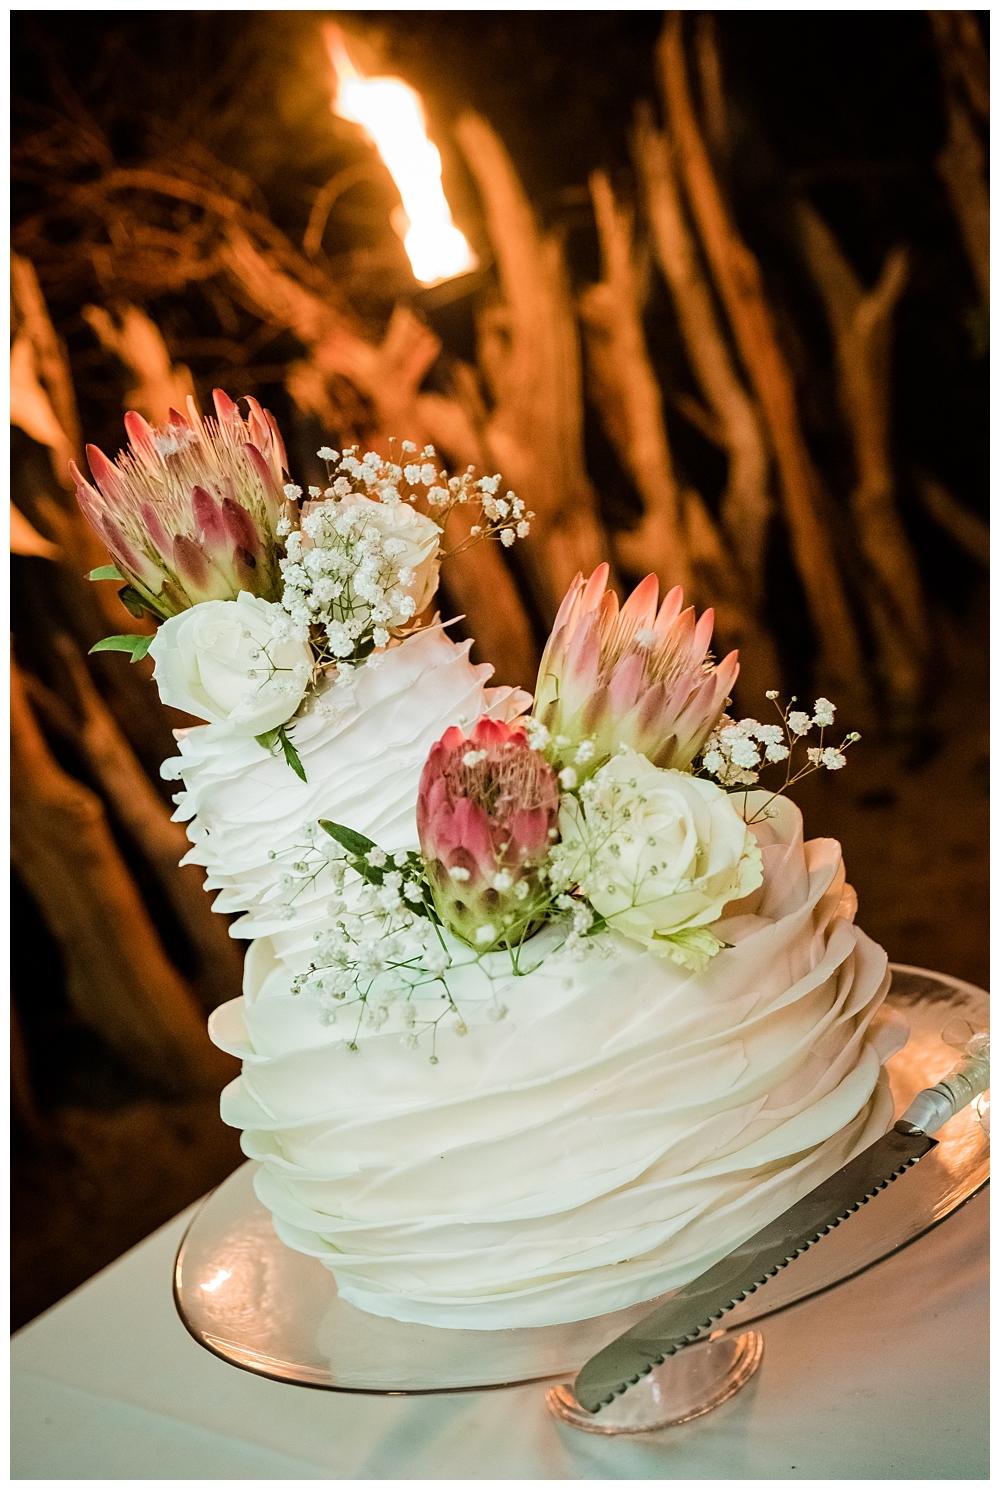 Best_Wedding_Photographer_AlexanderSmith_0125.jpg